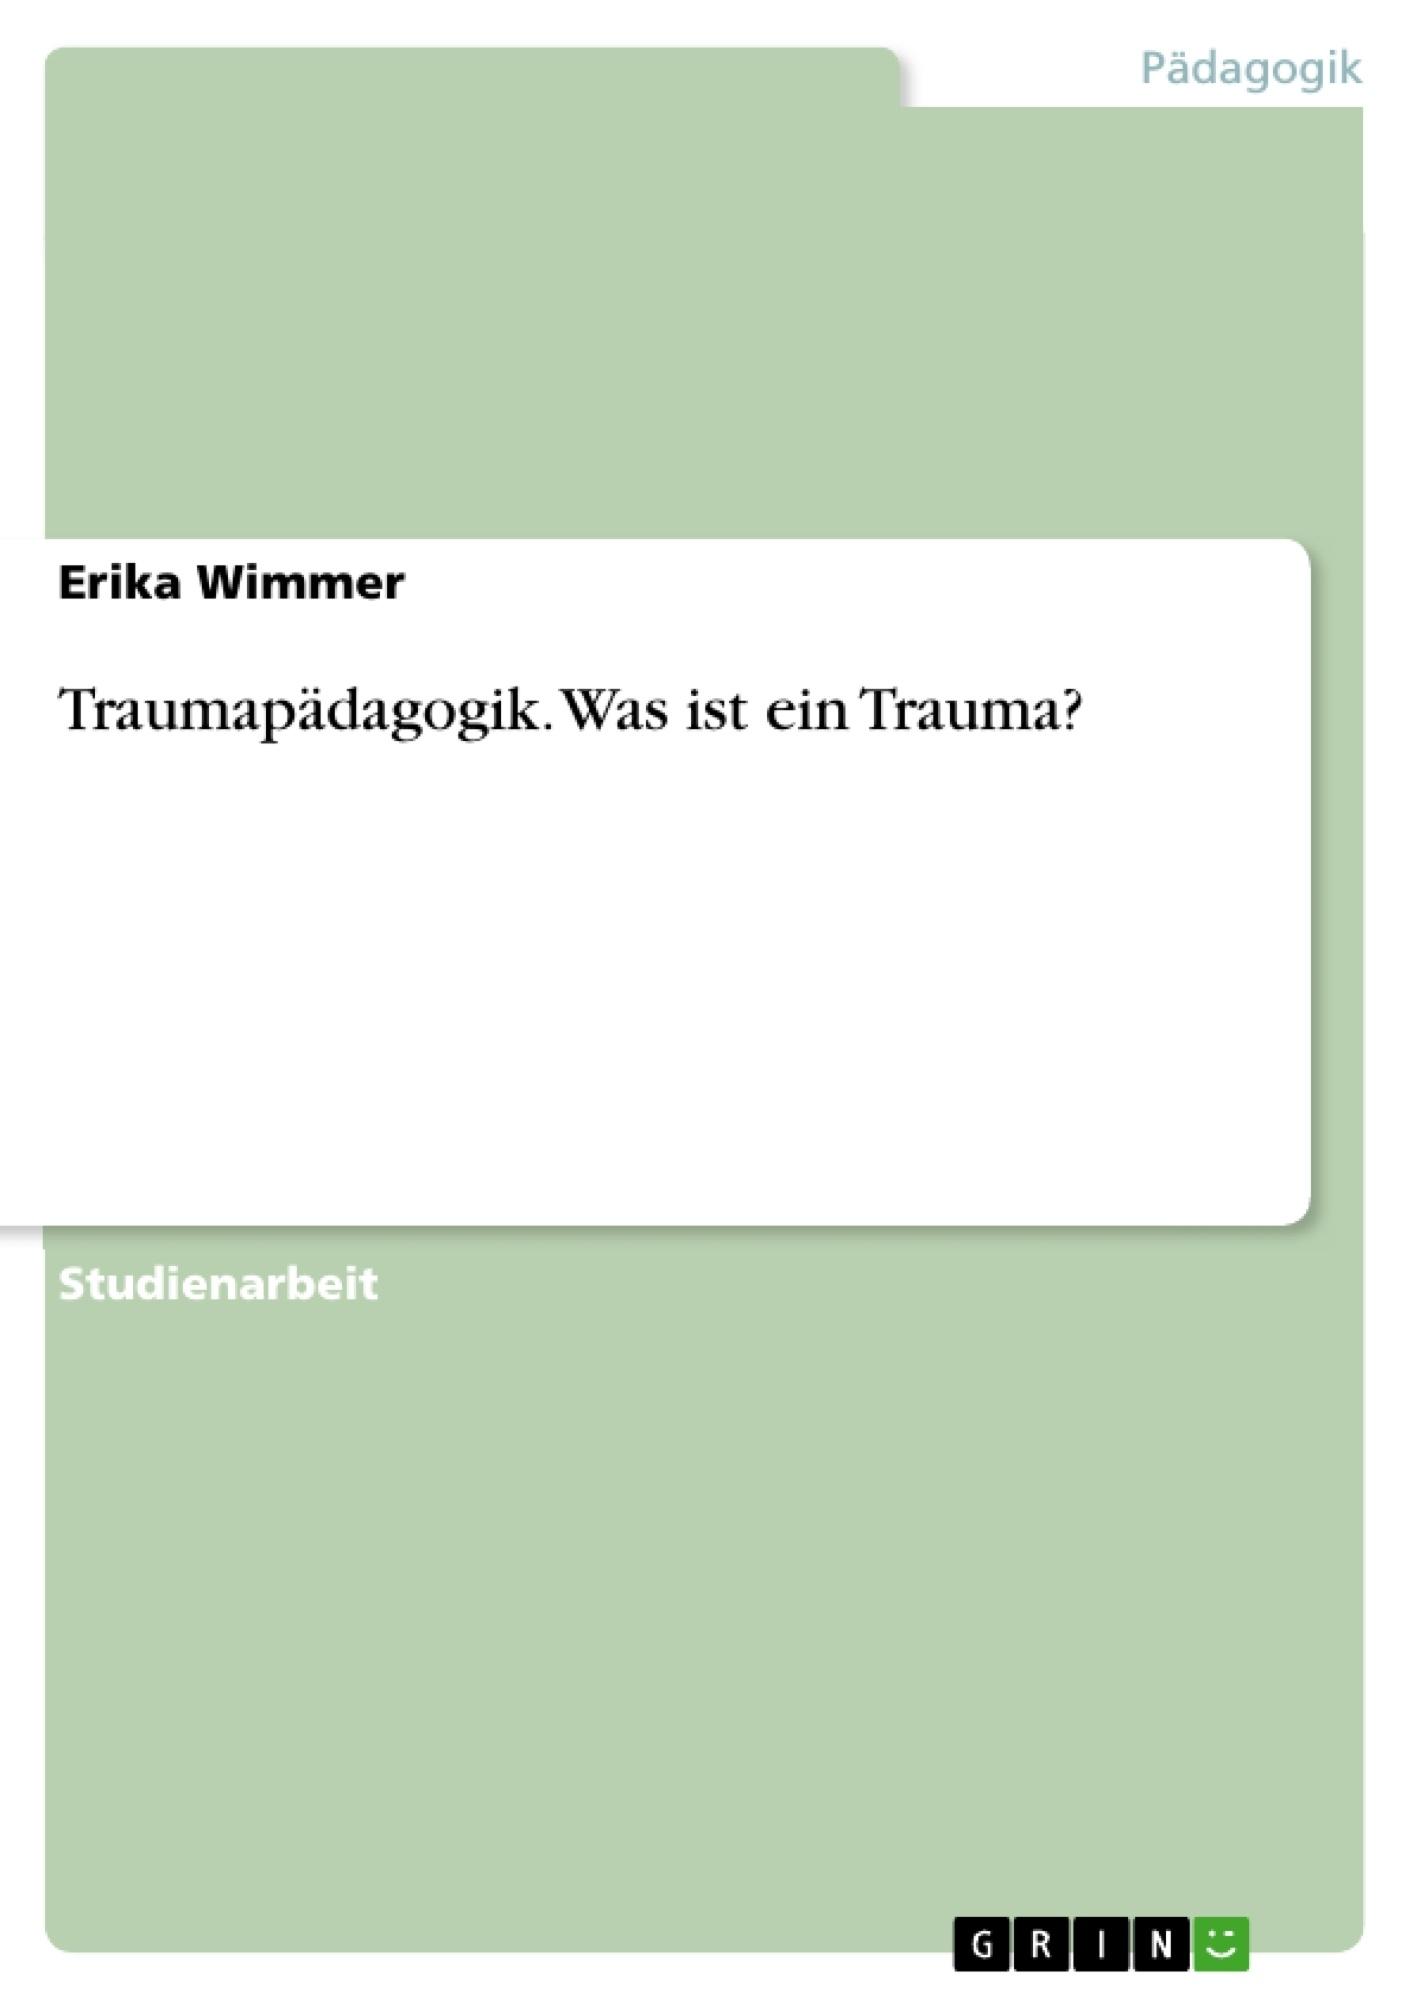 Titel: Traumapädagogik. Was ist ein Trauma?